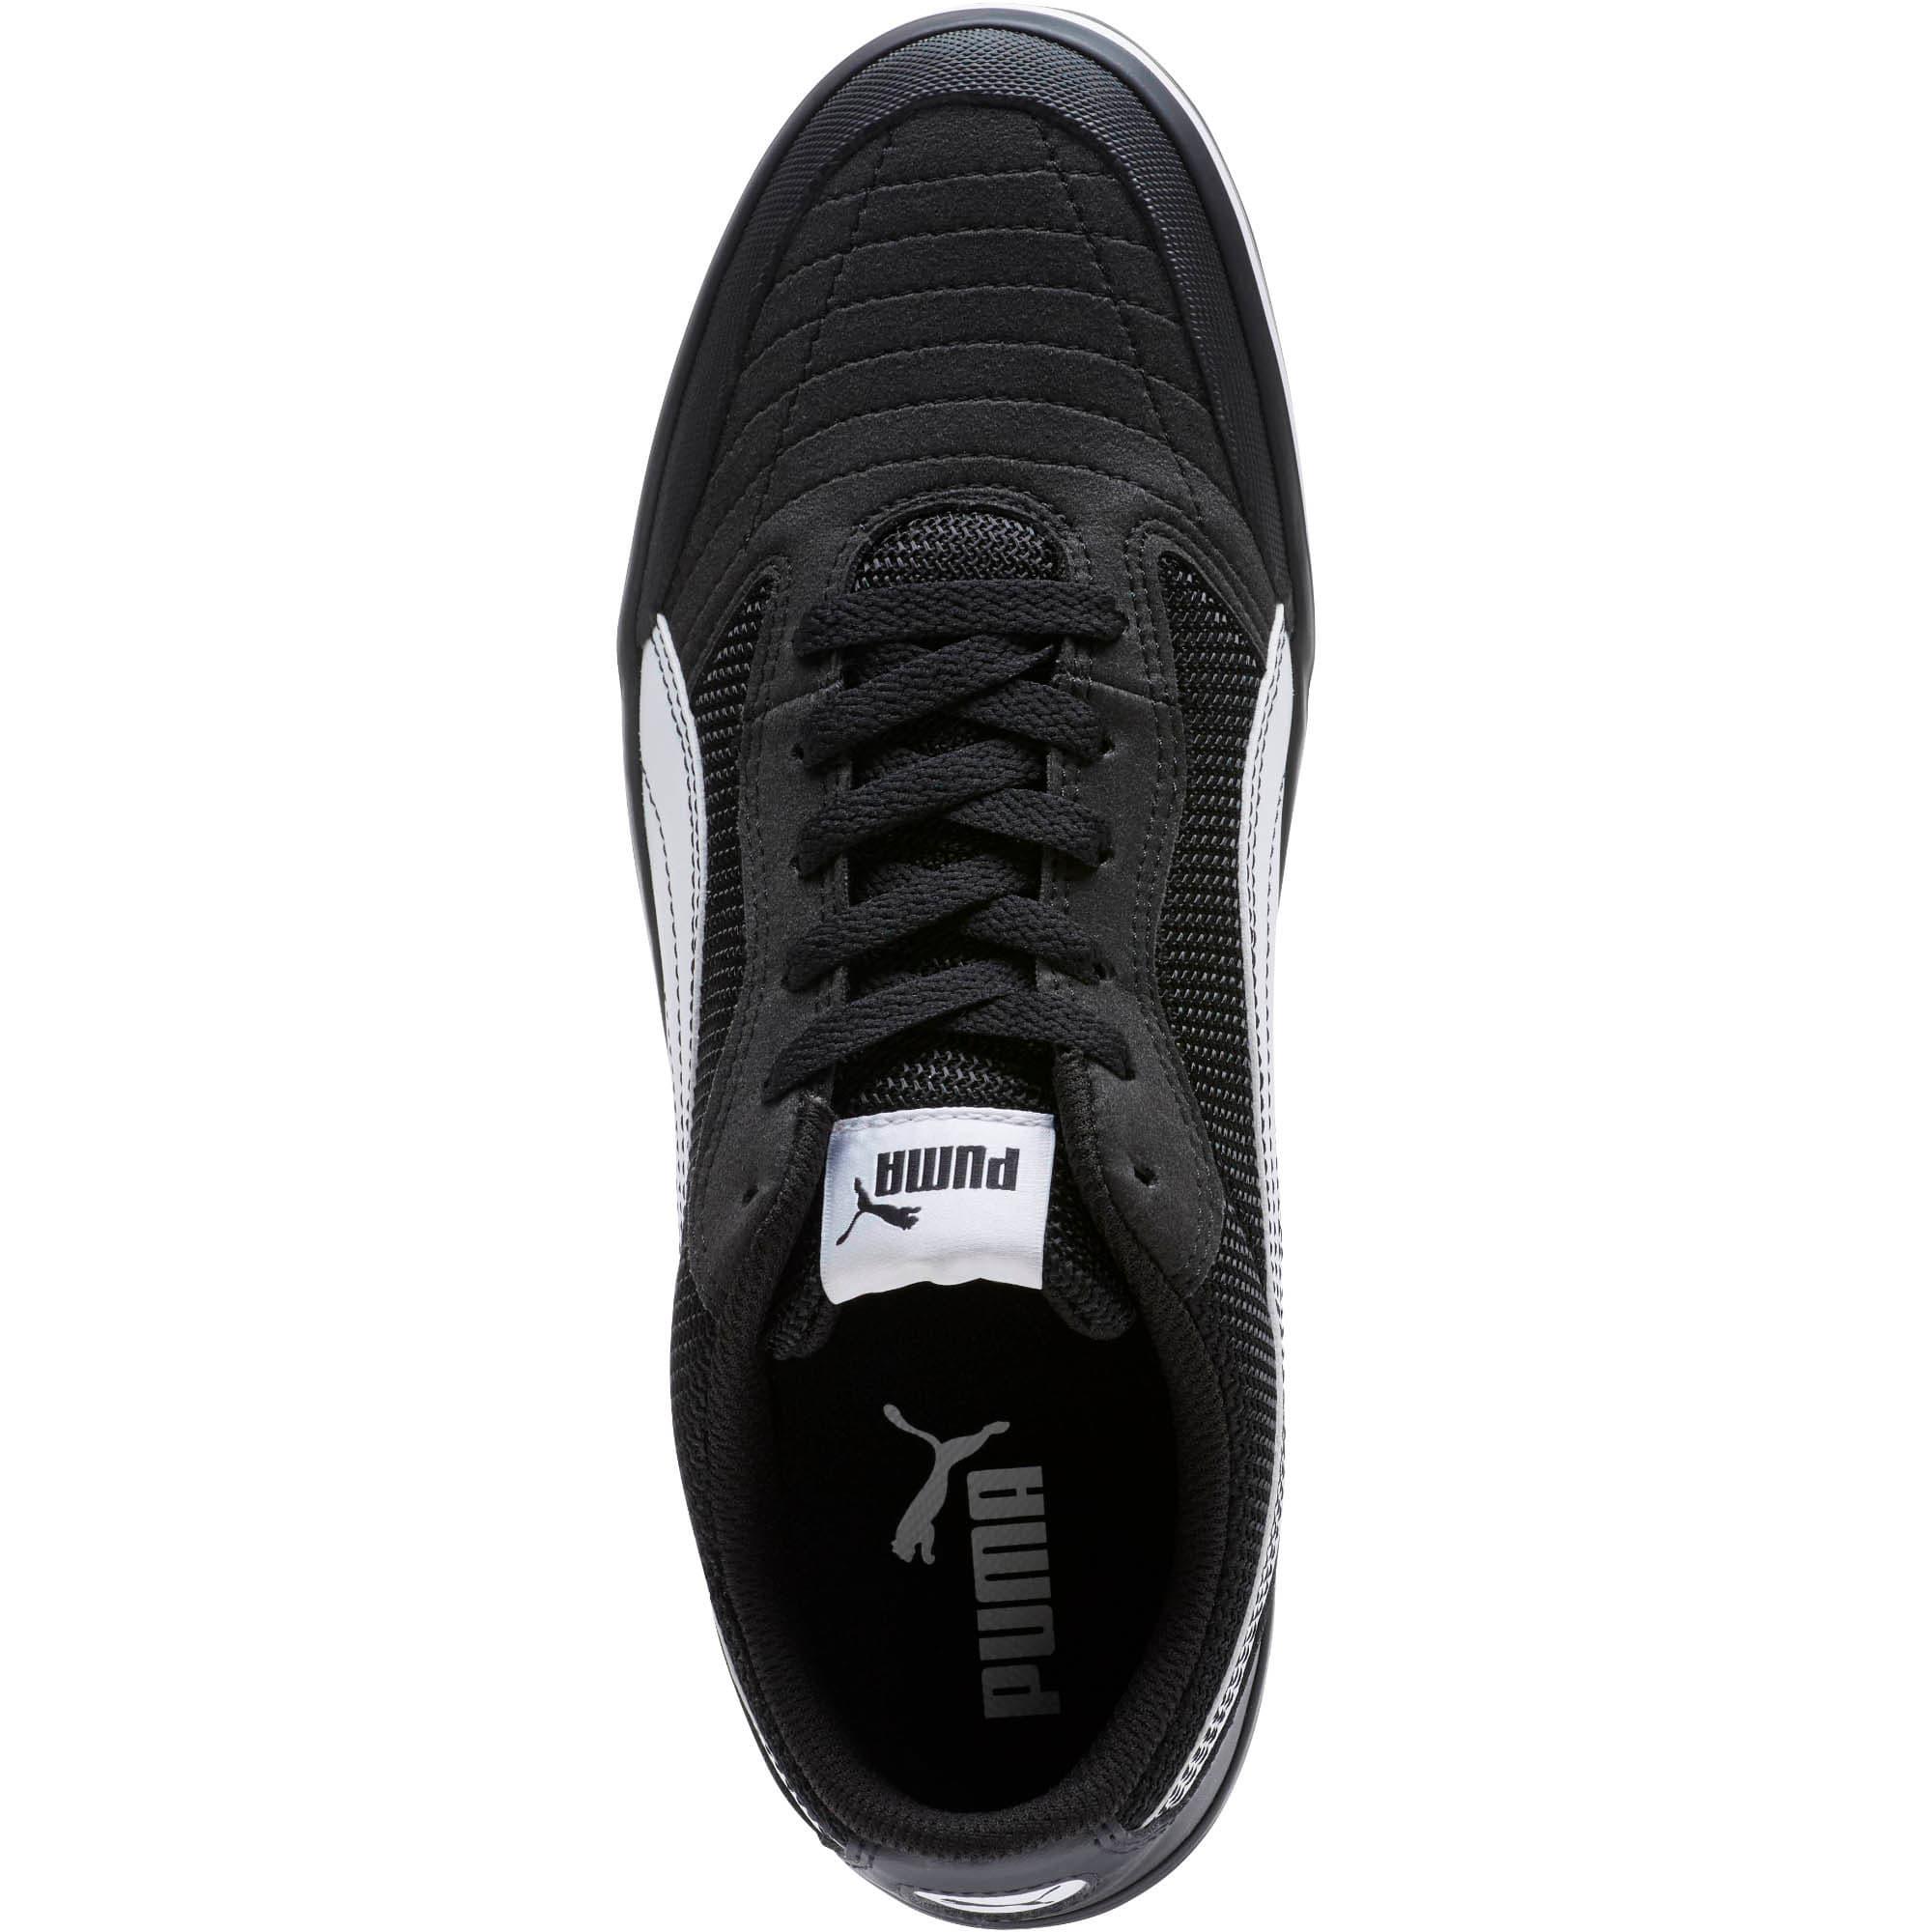 Thumbnail 5 of Astro Sala Sneakers, Puma Black-Puma White, medium